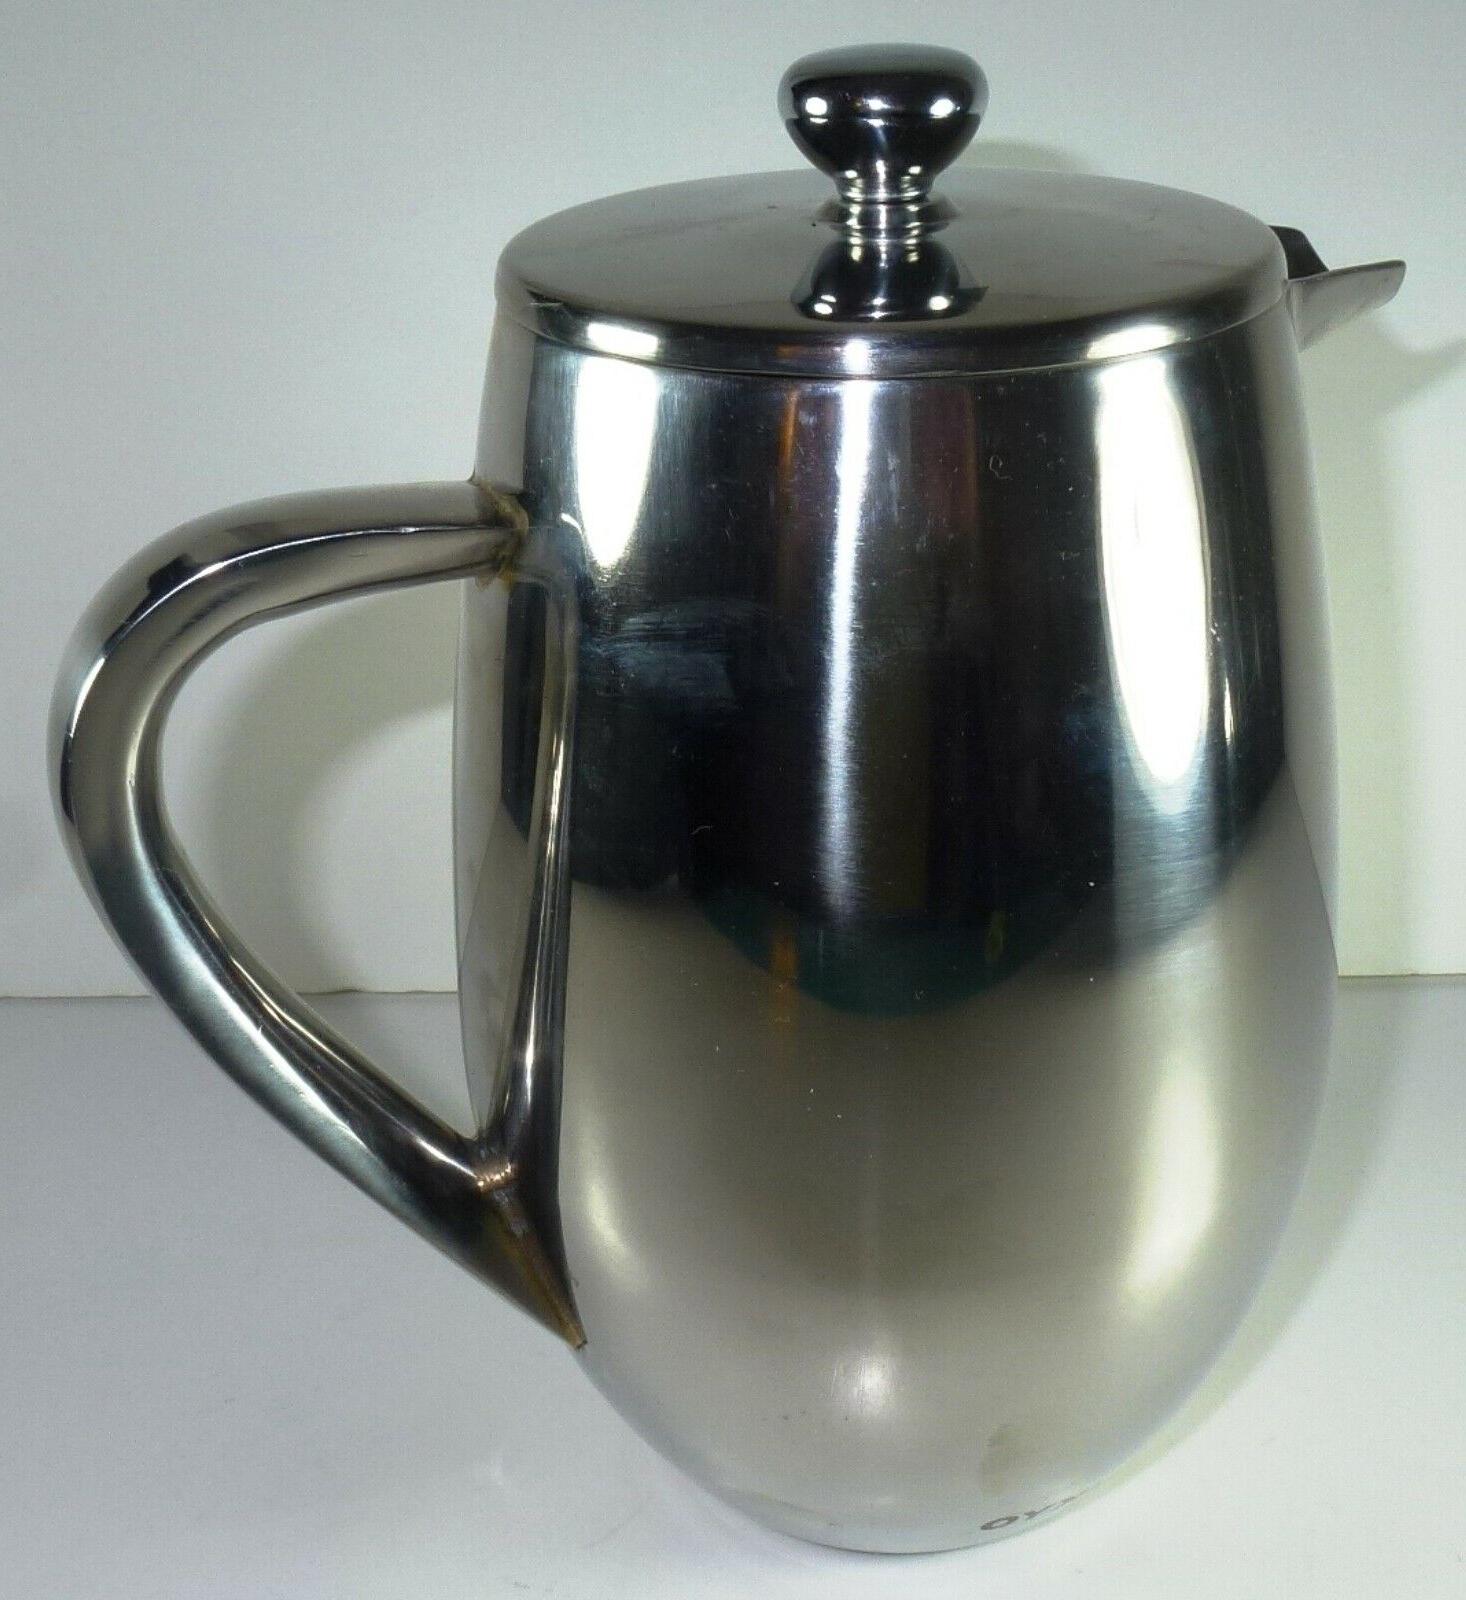 *NWOB* Press Stainless Steel Coffee Maker 34